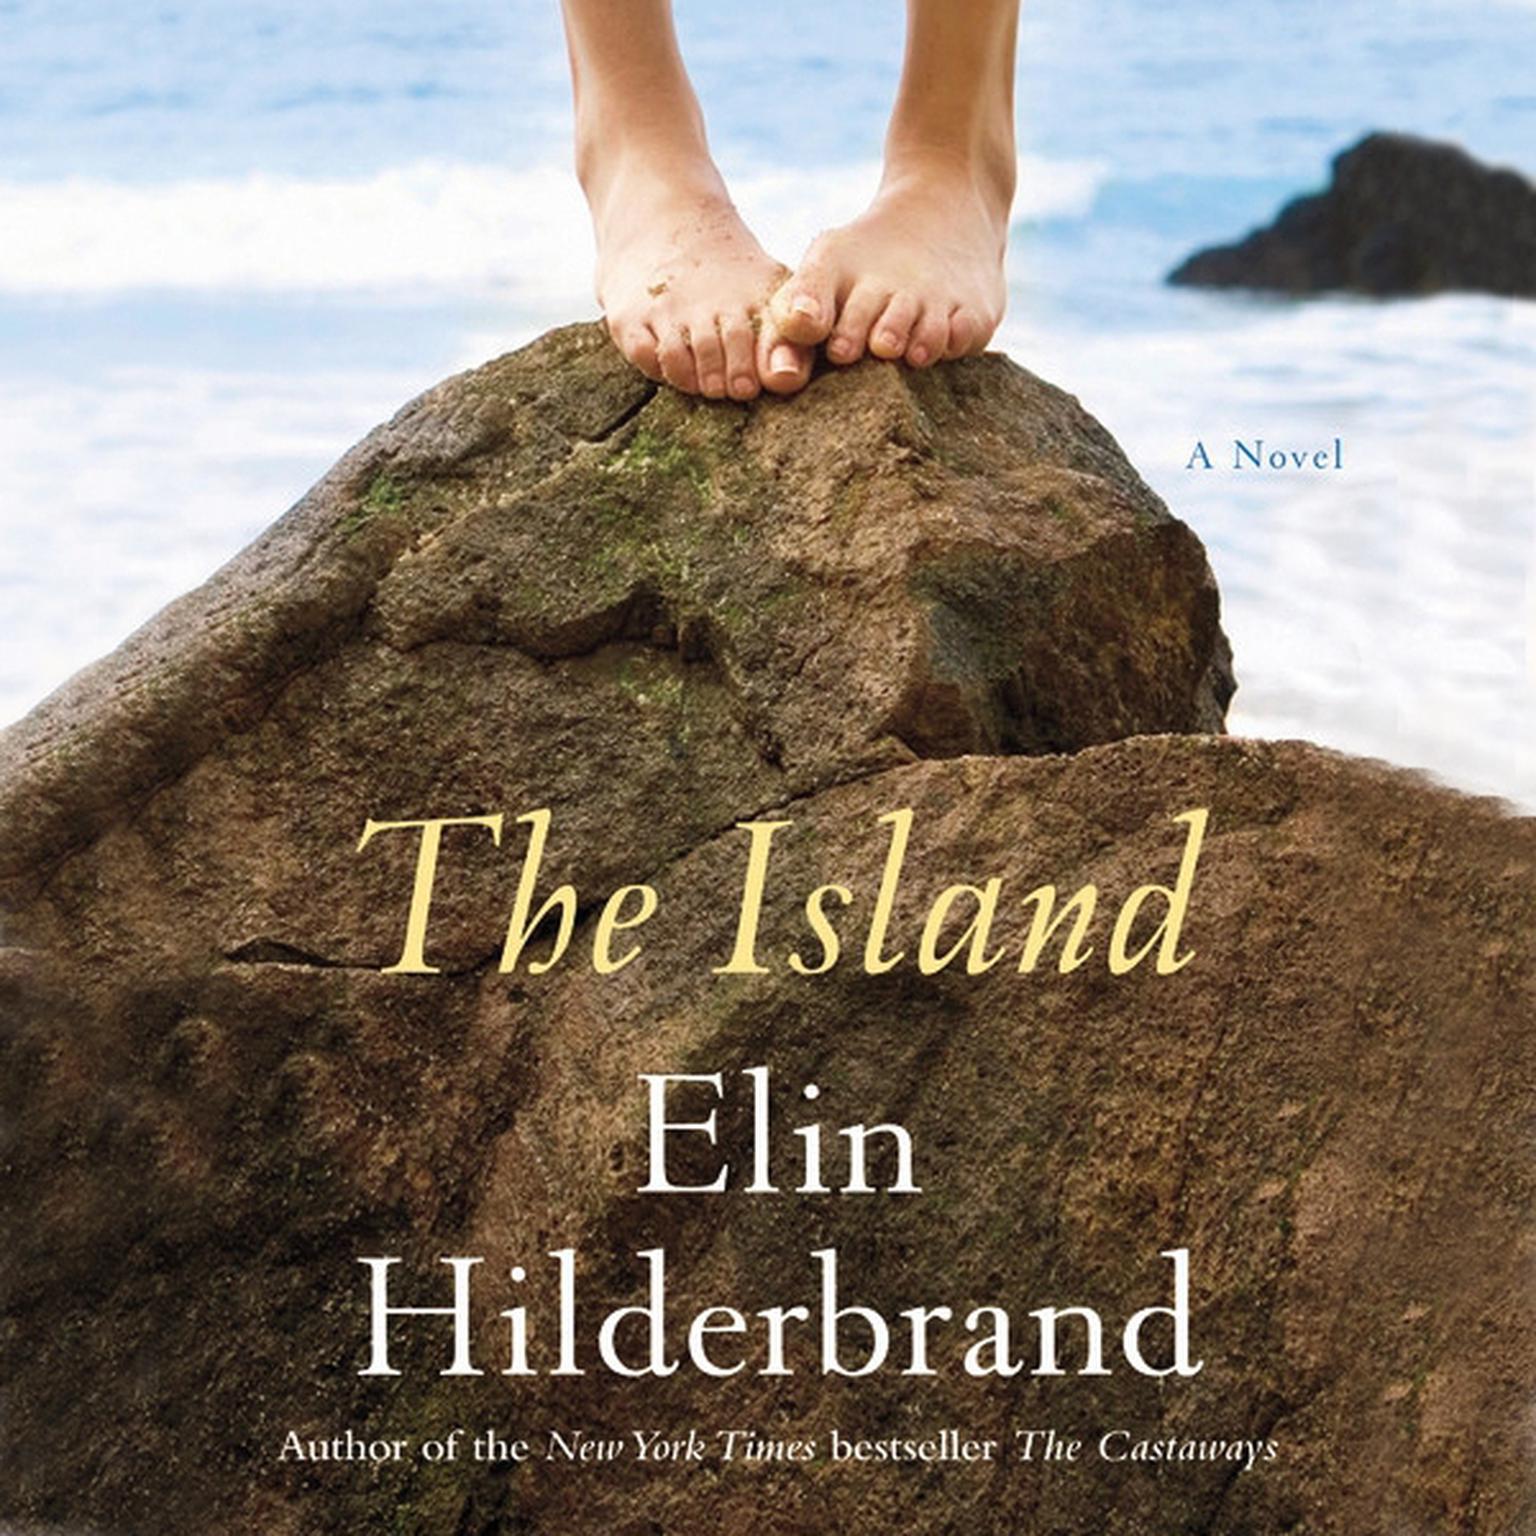 Printable The Island: A Novel Audiobook Cover Art